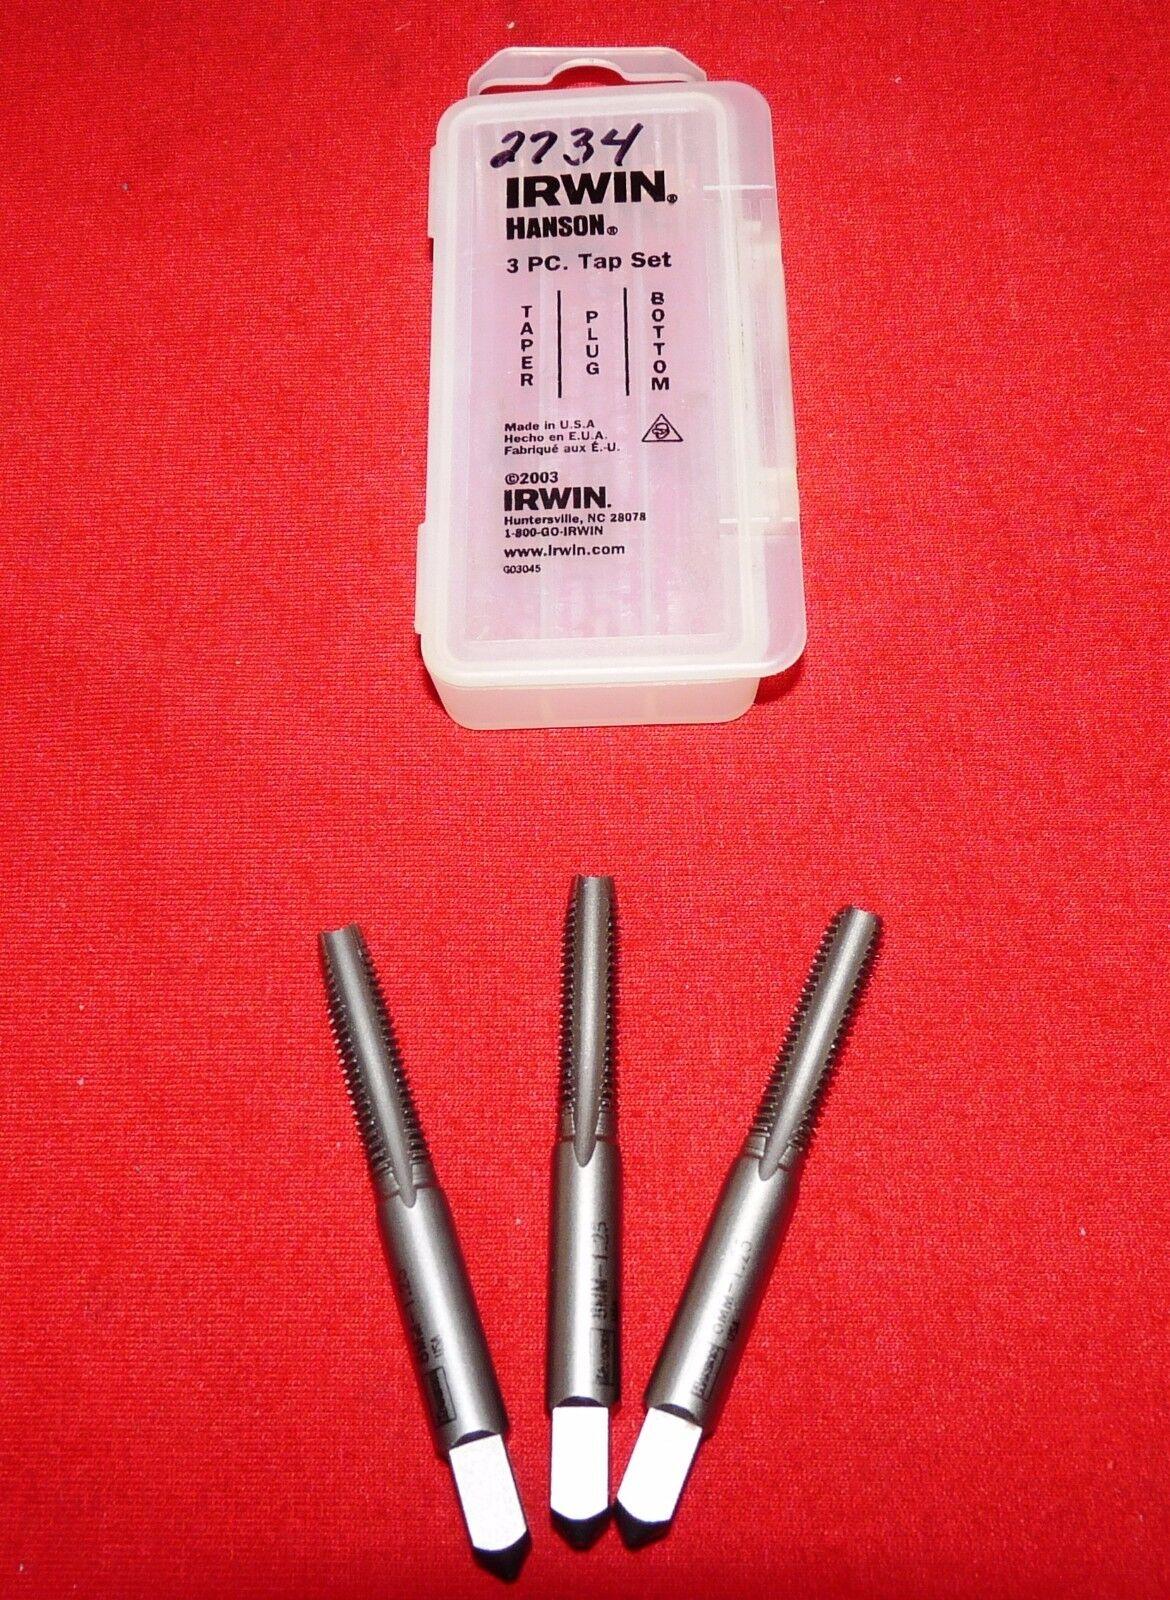 Irwin Tools 2734 3 Piece Set Tap 8 mm 1 25 Brand New